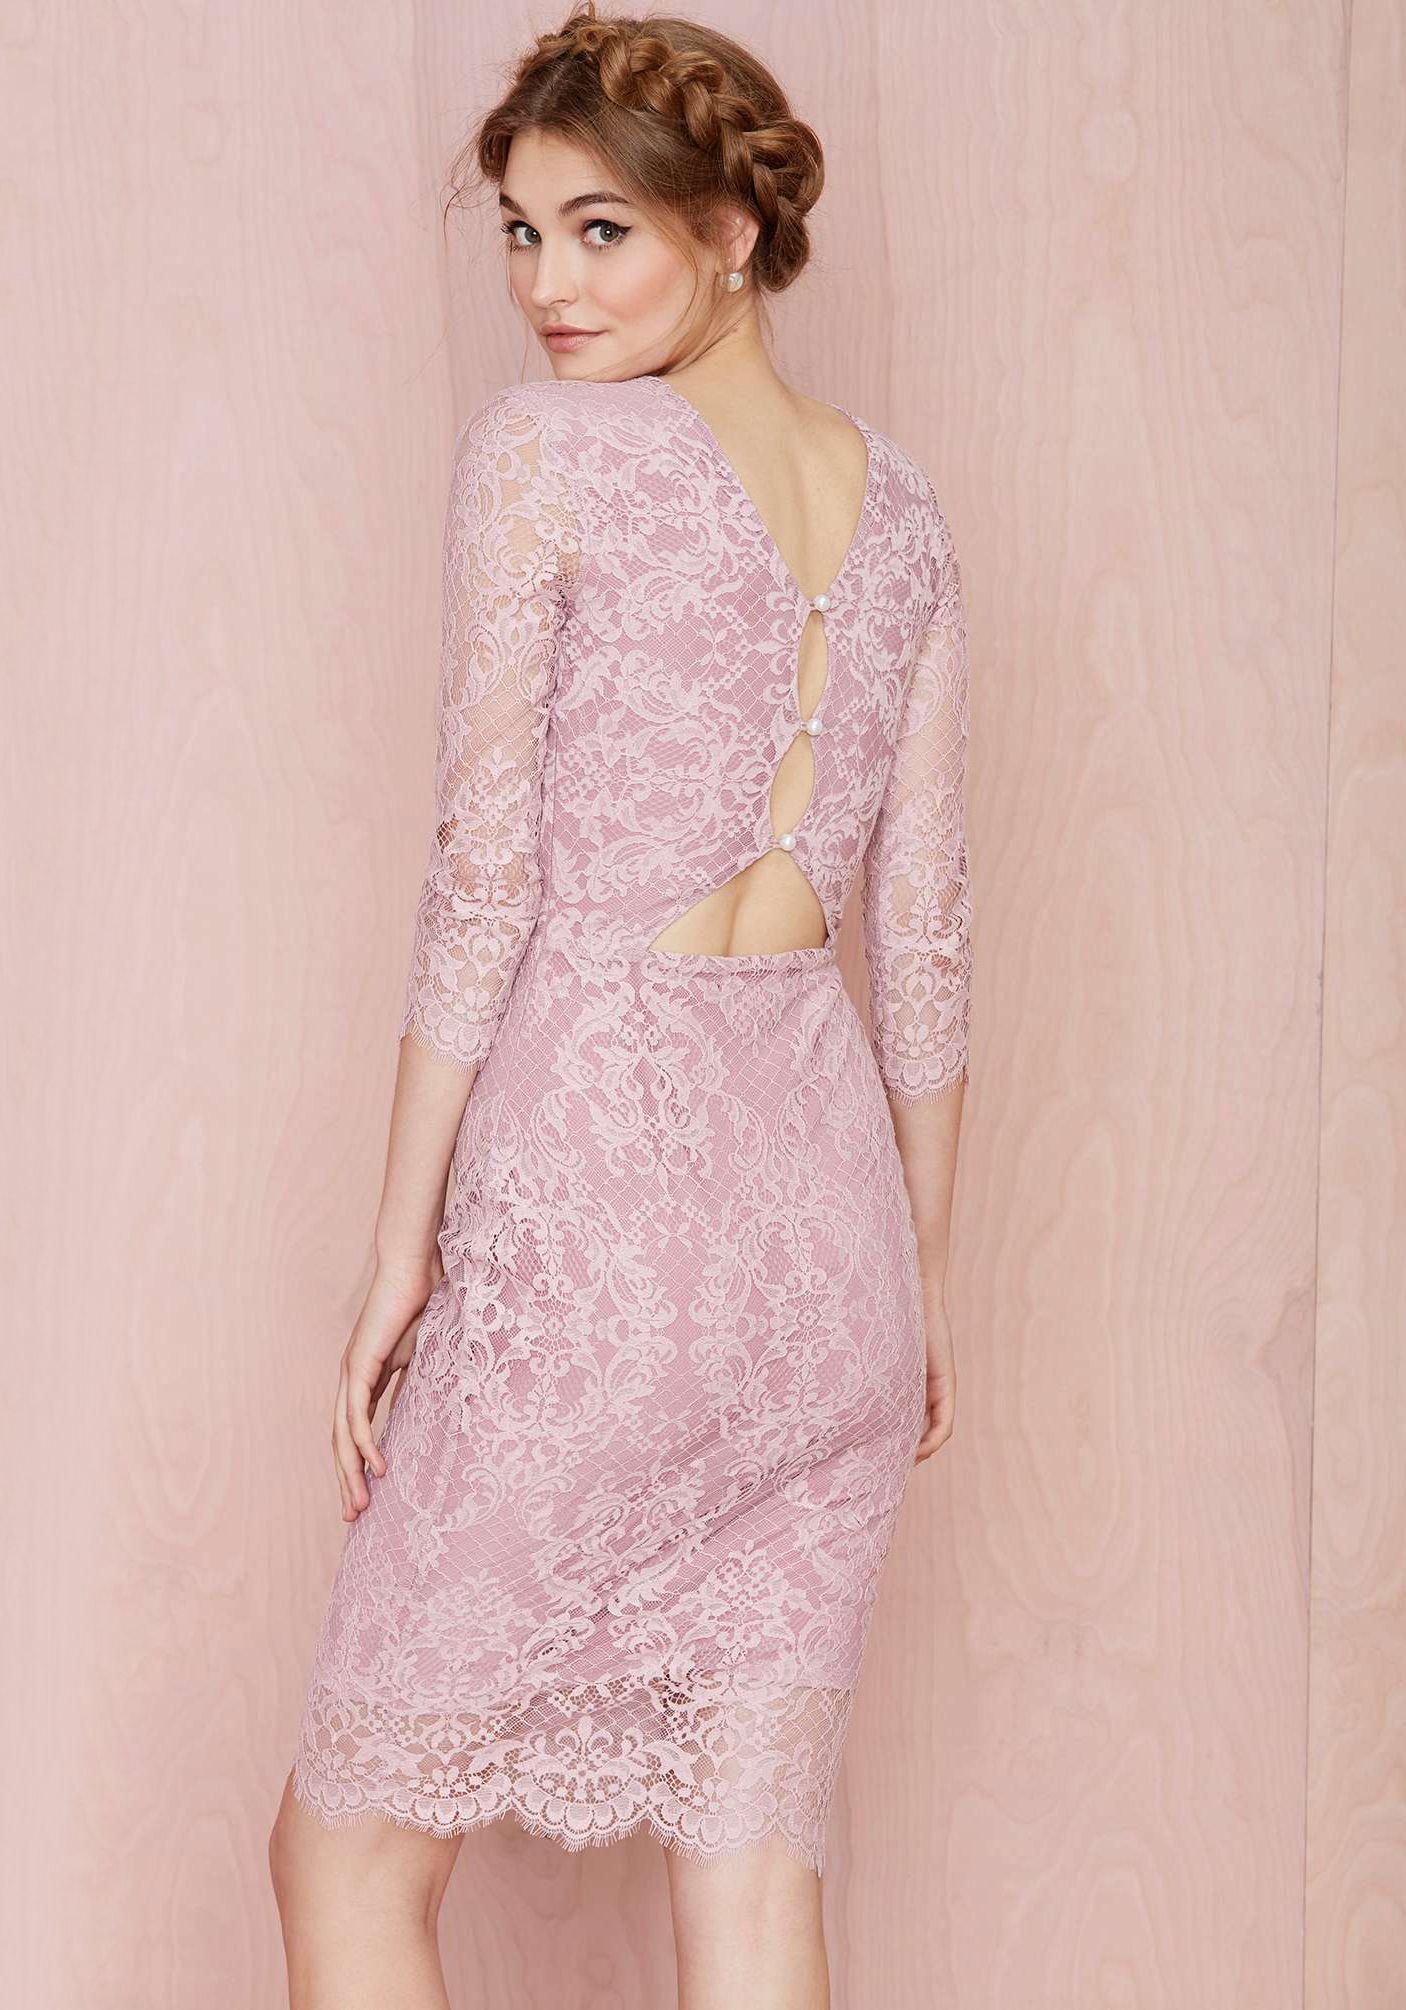 Vestido encaje manga larga-violeta 17.34 | Cosas para comprar ...